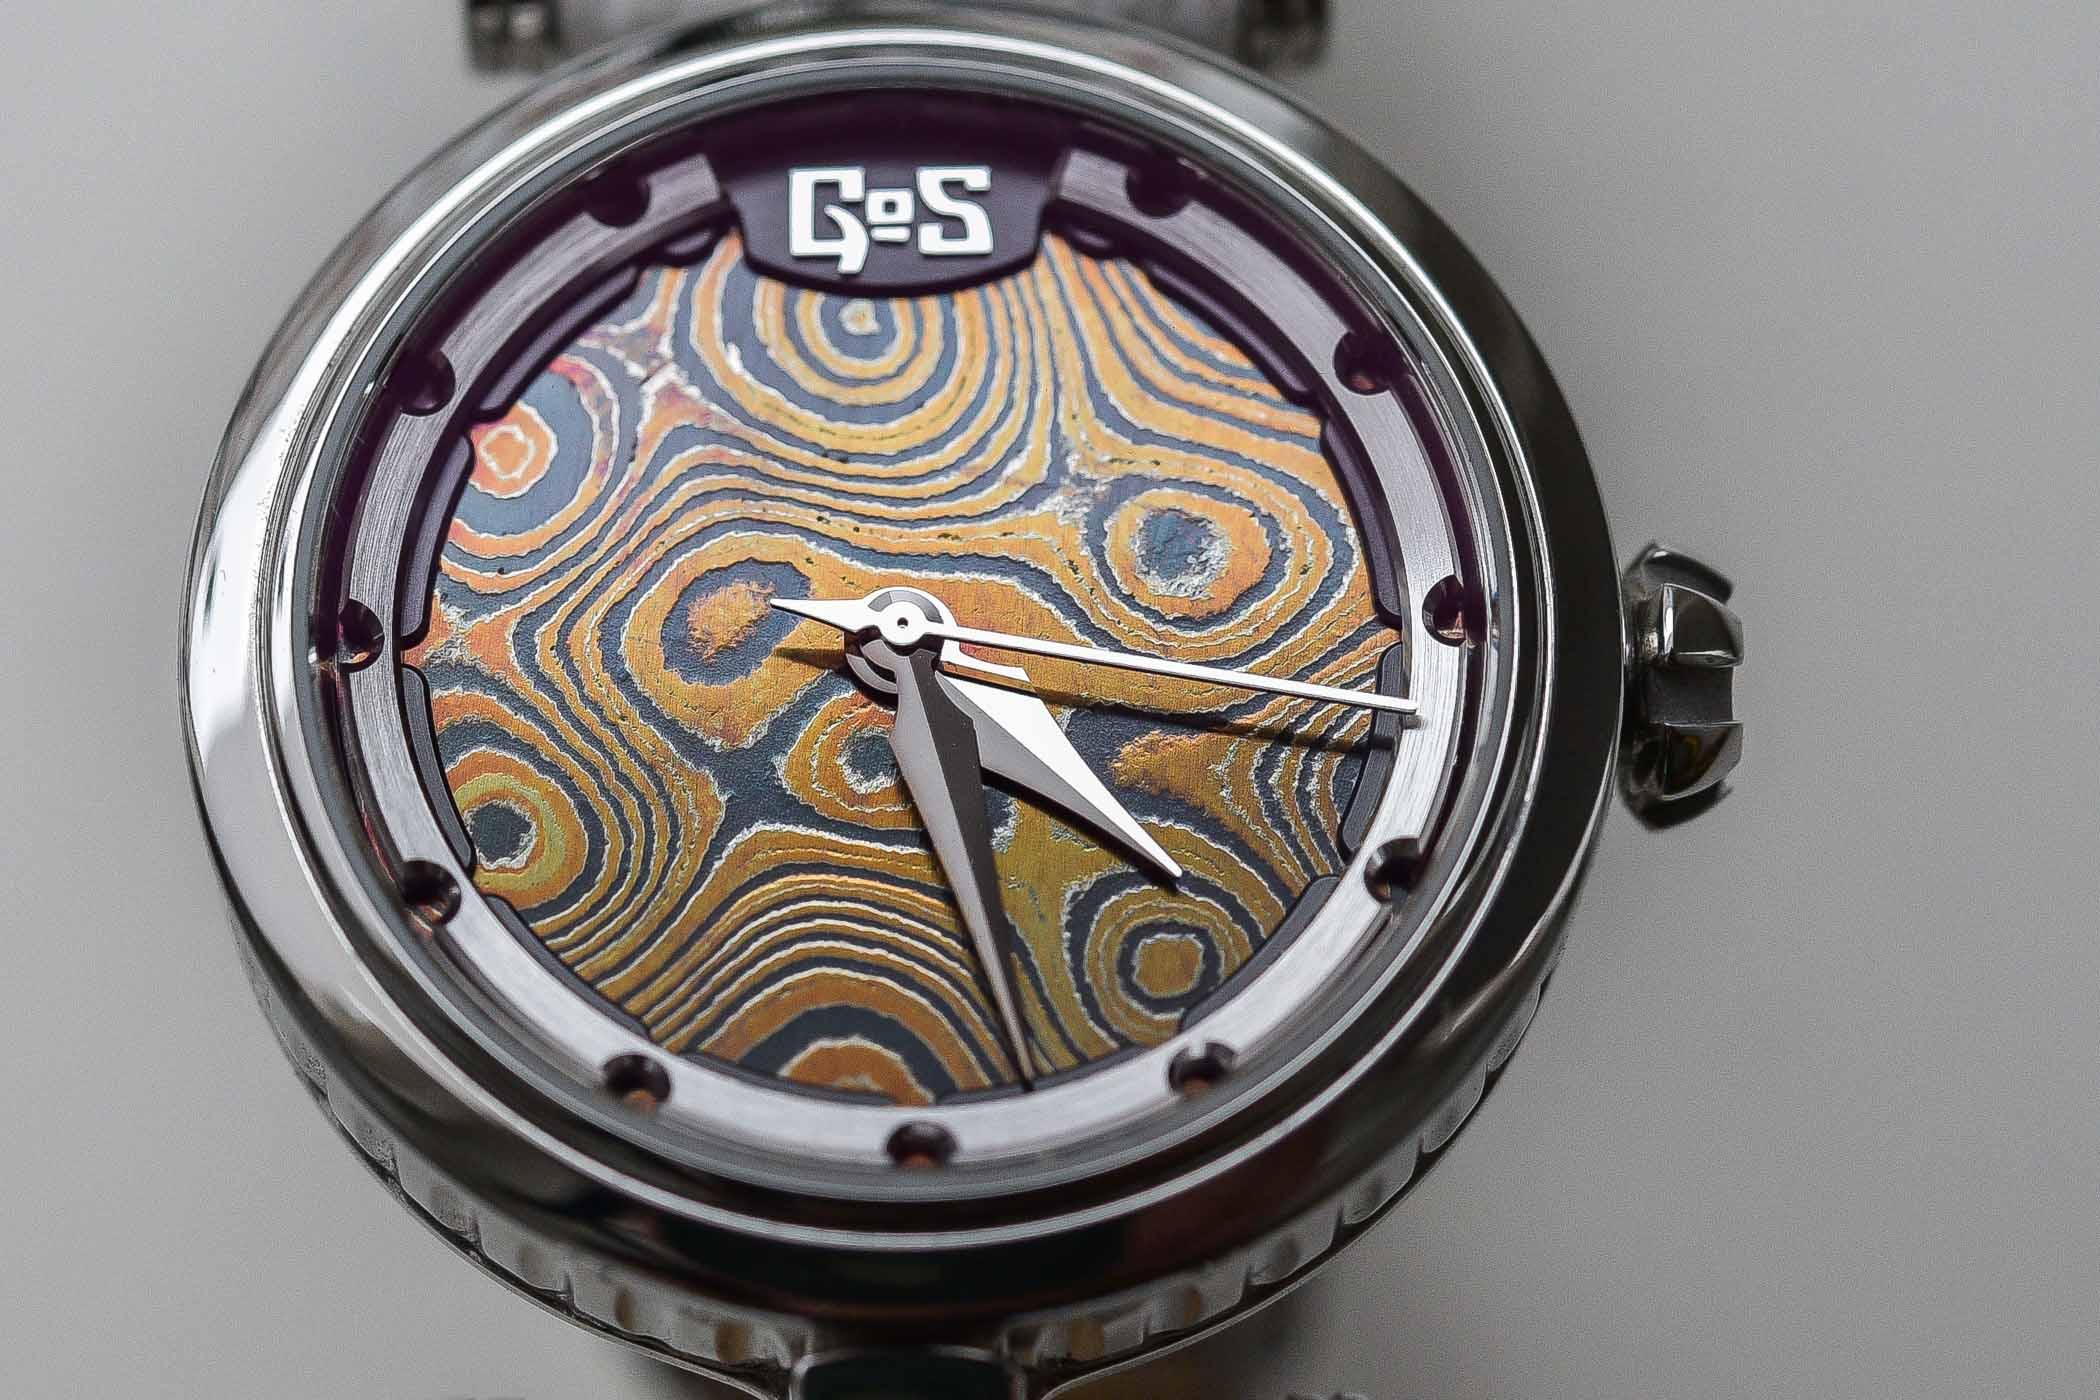 GoS Watche Sarek Ladies Damascus steel dial